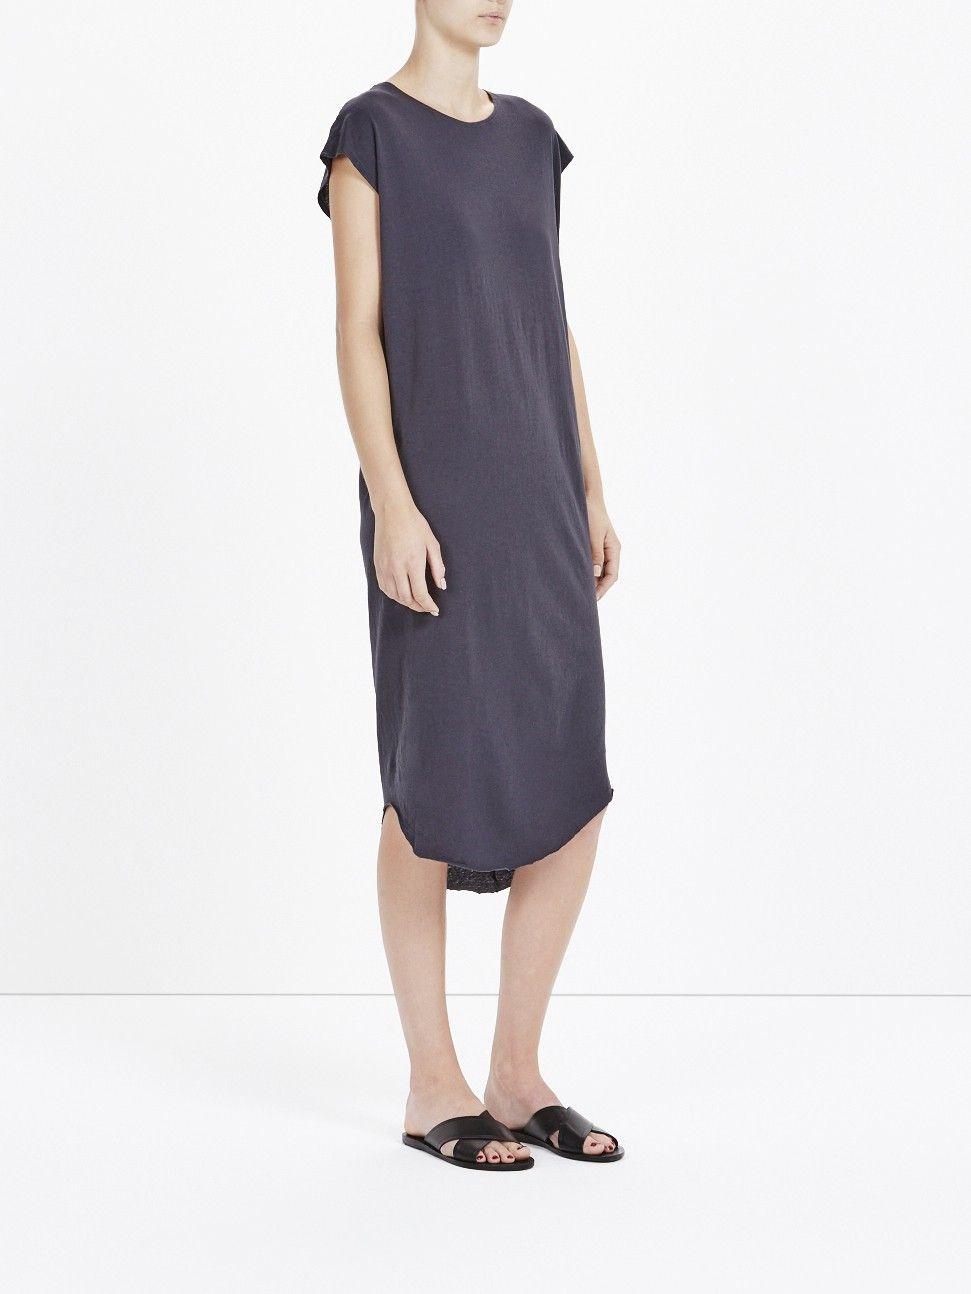 round neck cap sleeve tank dress with curved asymmetric hem. bottom ...